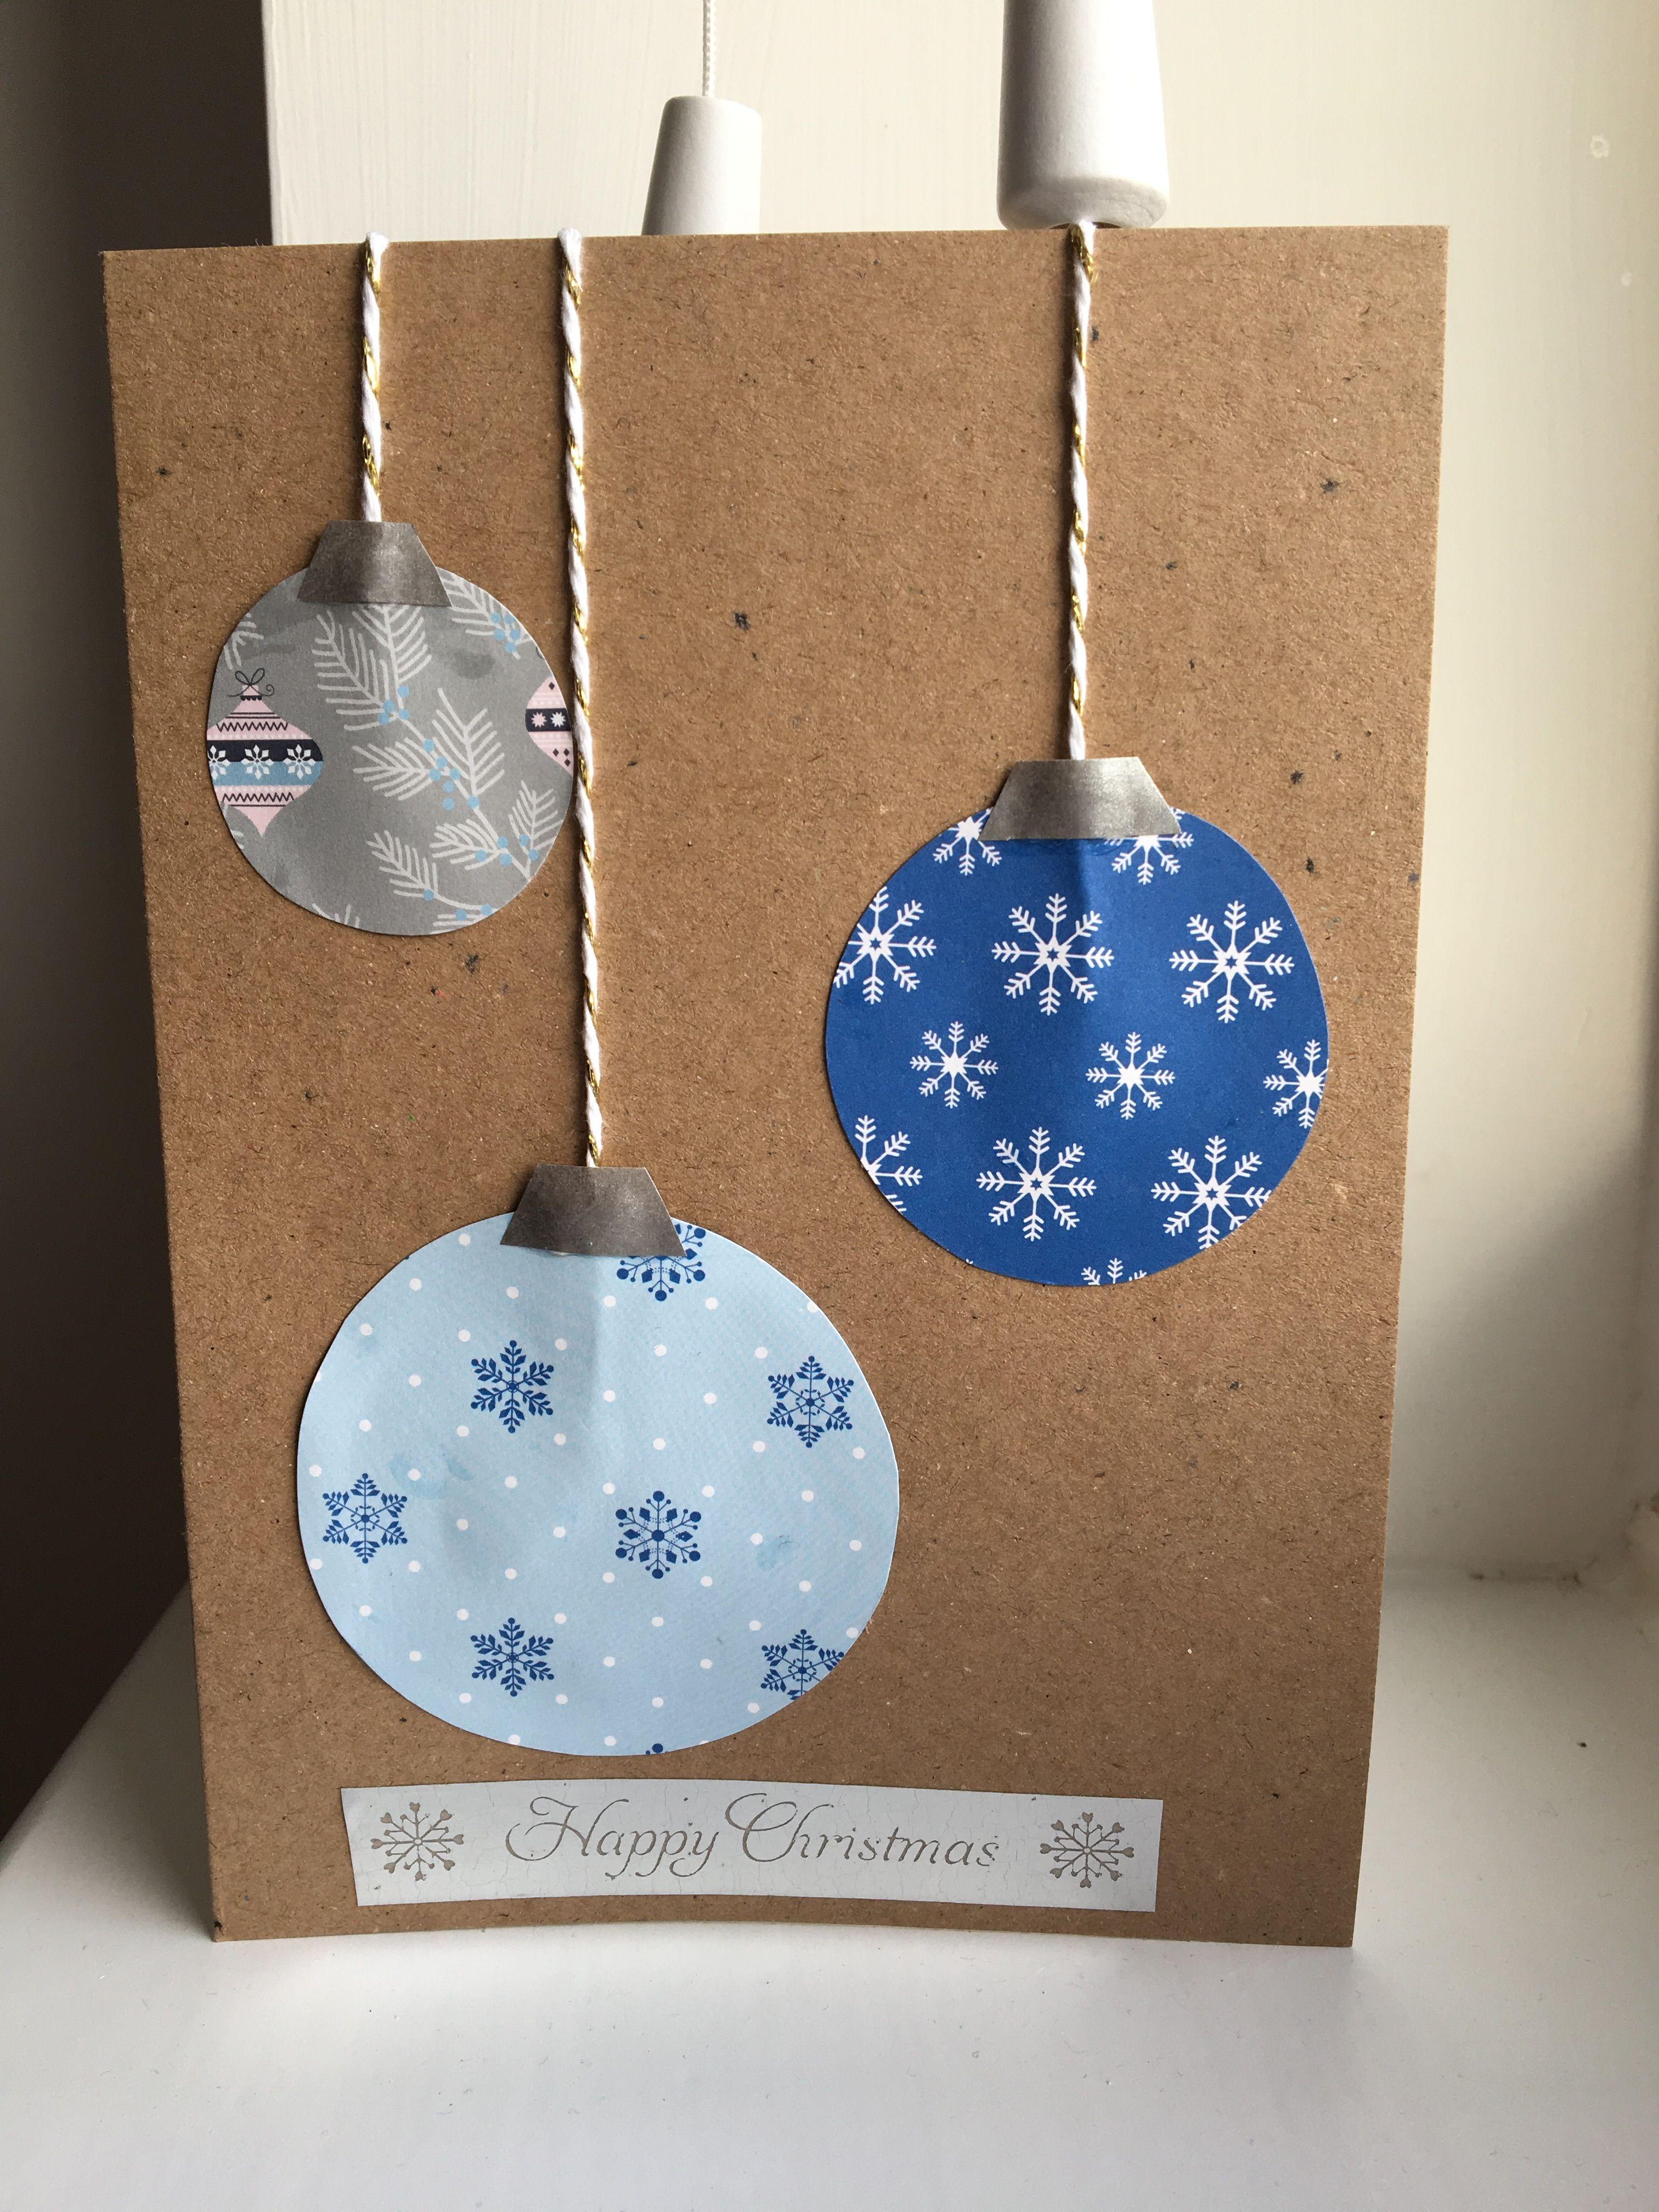 Homemade Christmas cards for family 💕 Www.etsy.com/uk/shop/BeeCubedCrafts